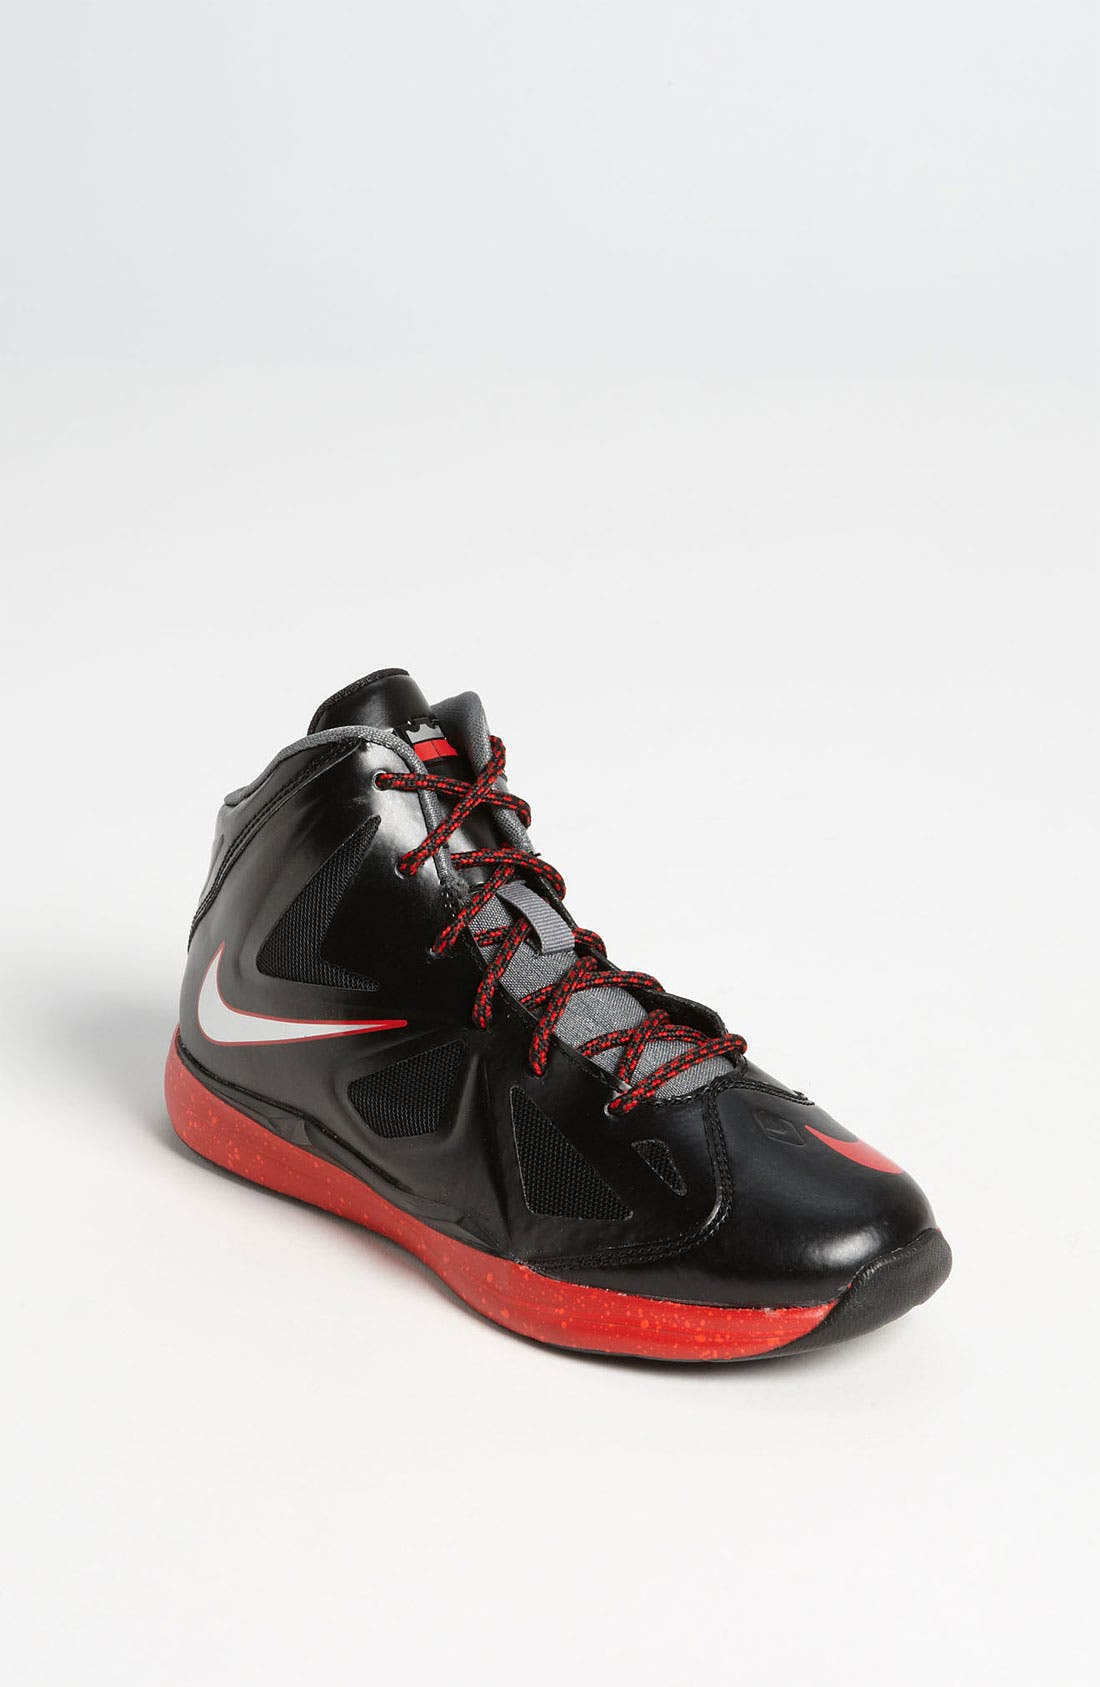 Main Image - Nike 'LeBron 10 Pressure' Basketball Shoe (Toddler & Little Kid)